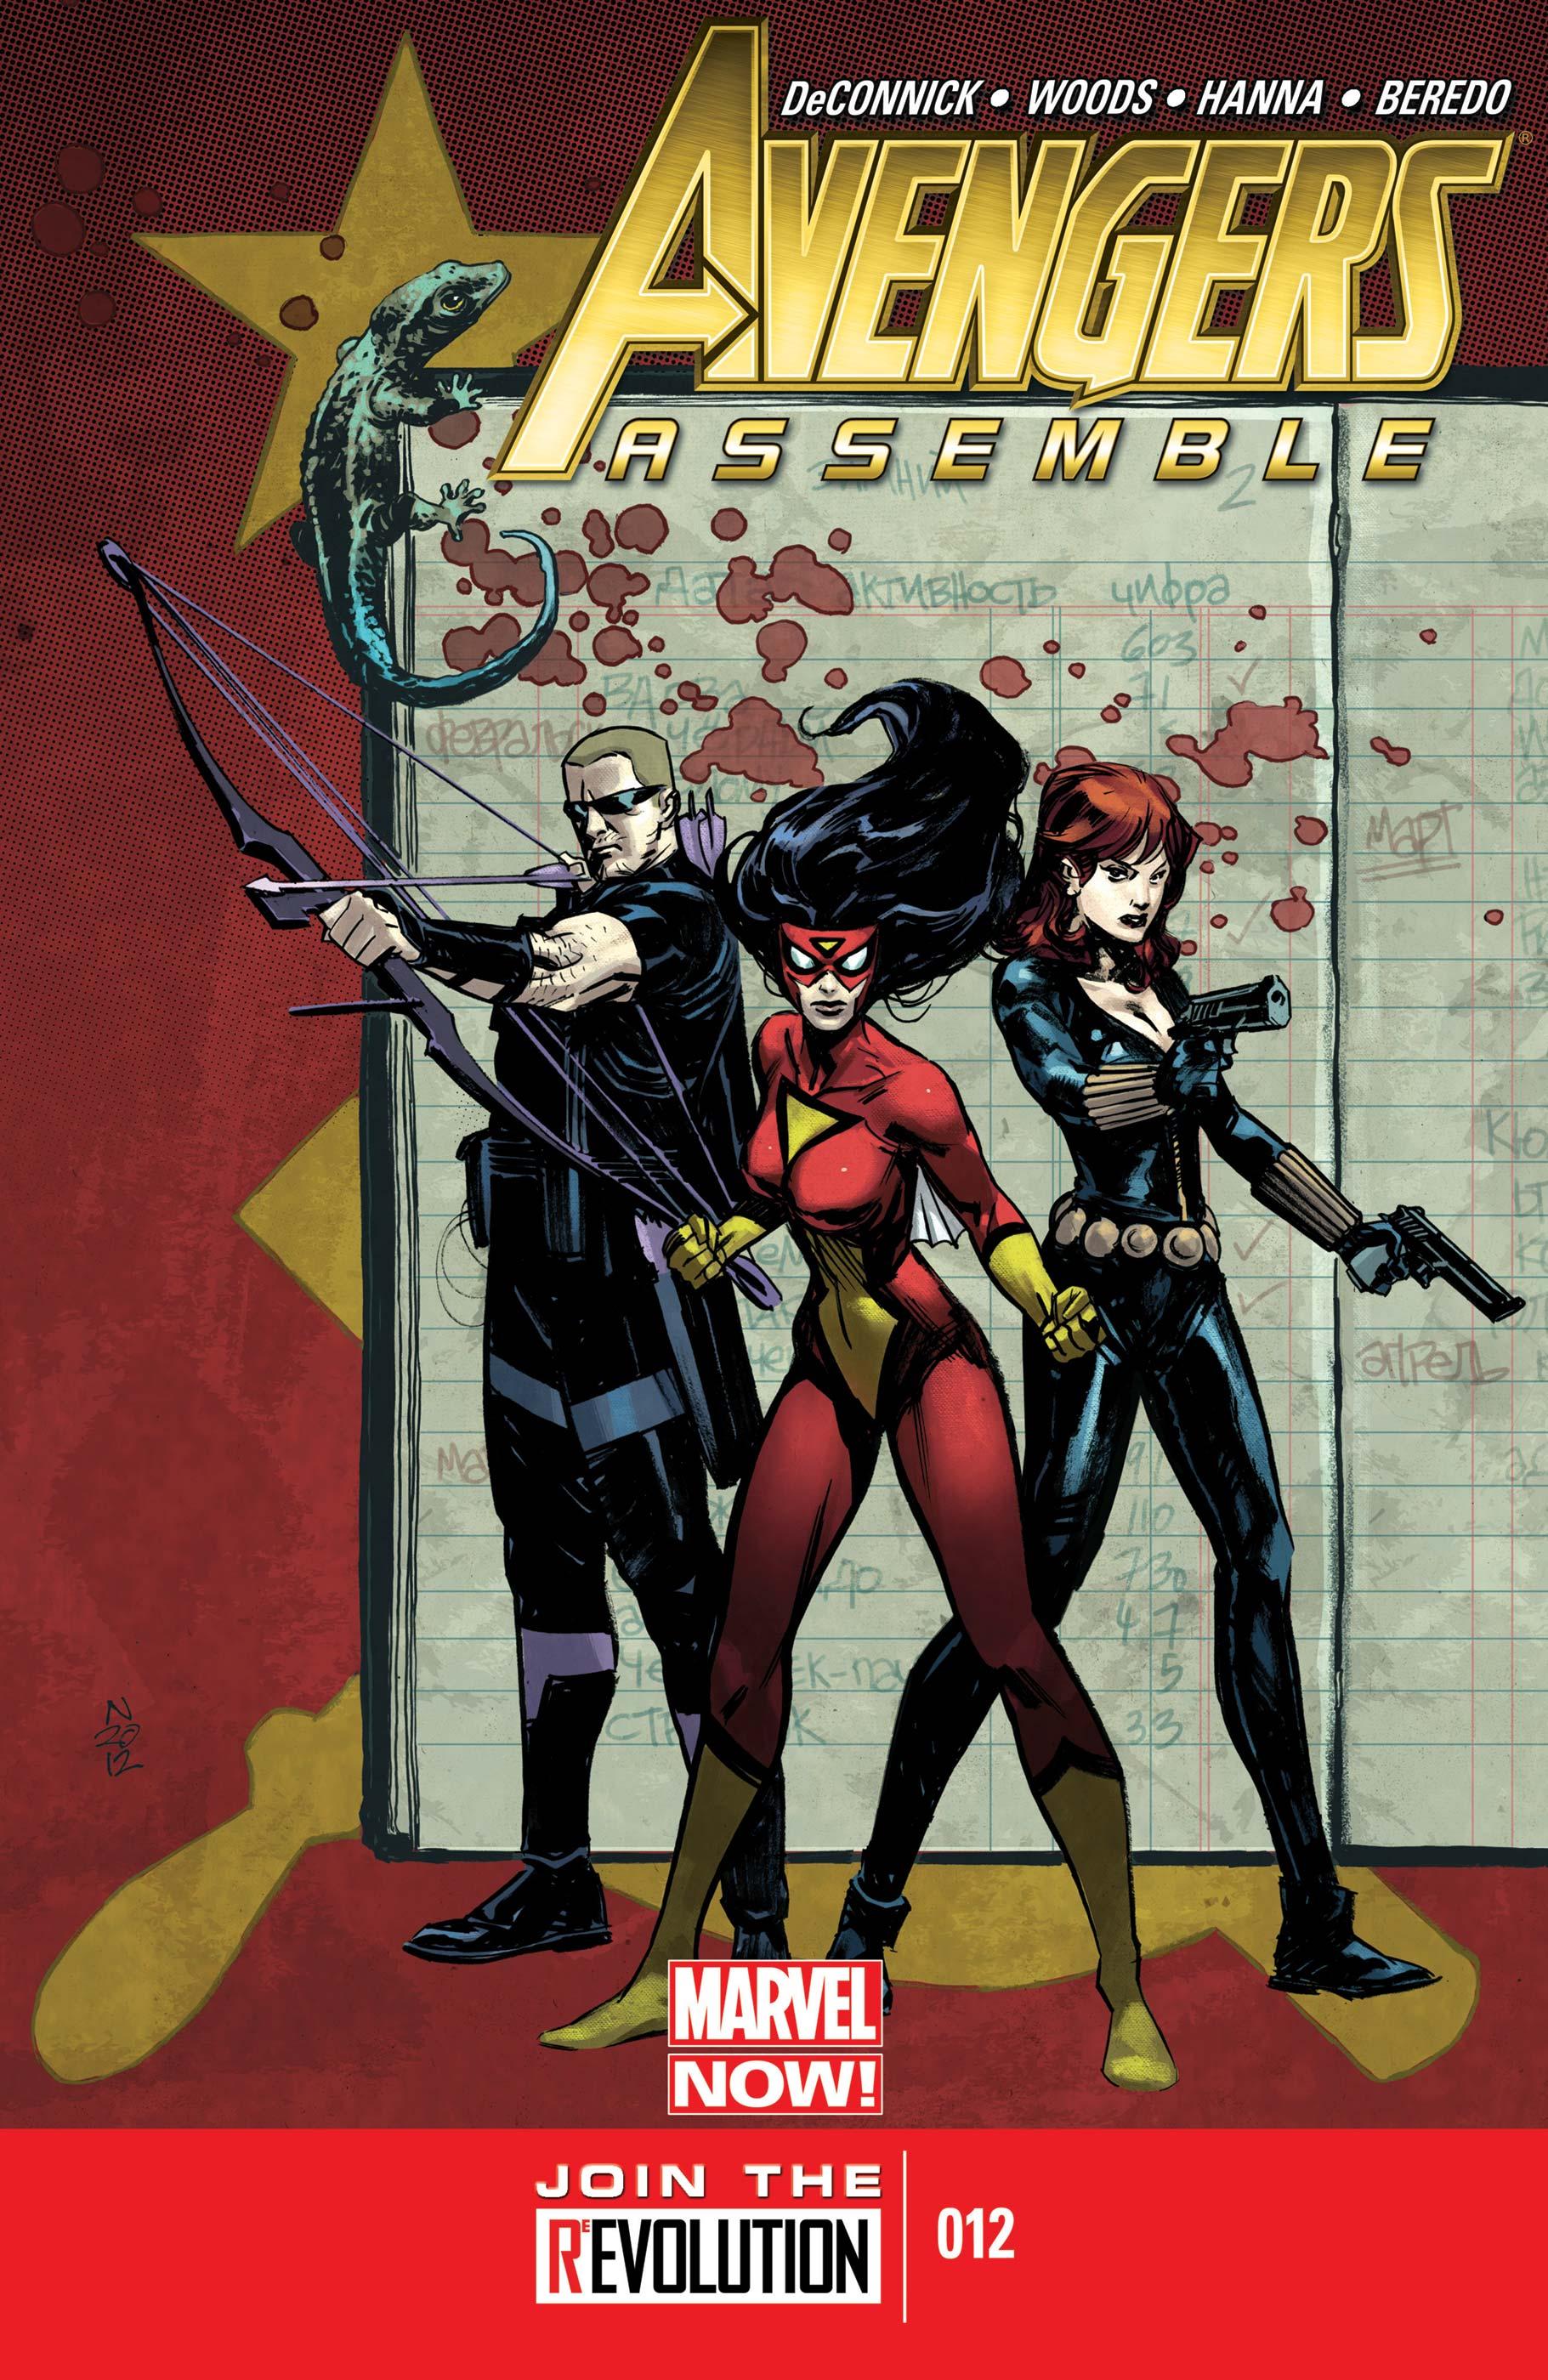 Avengers Assemble (2012) #12